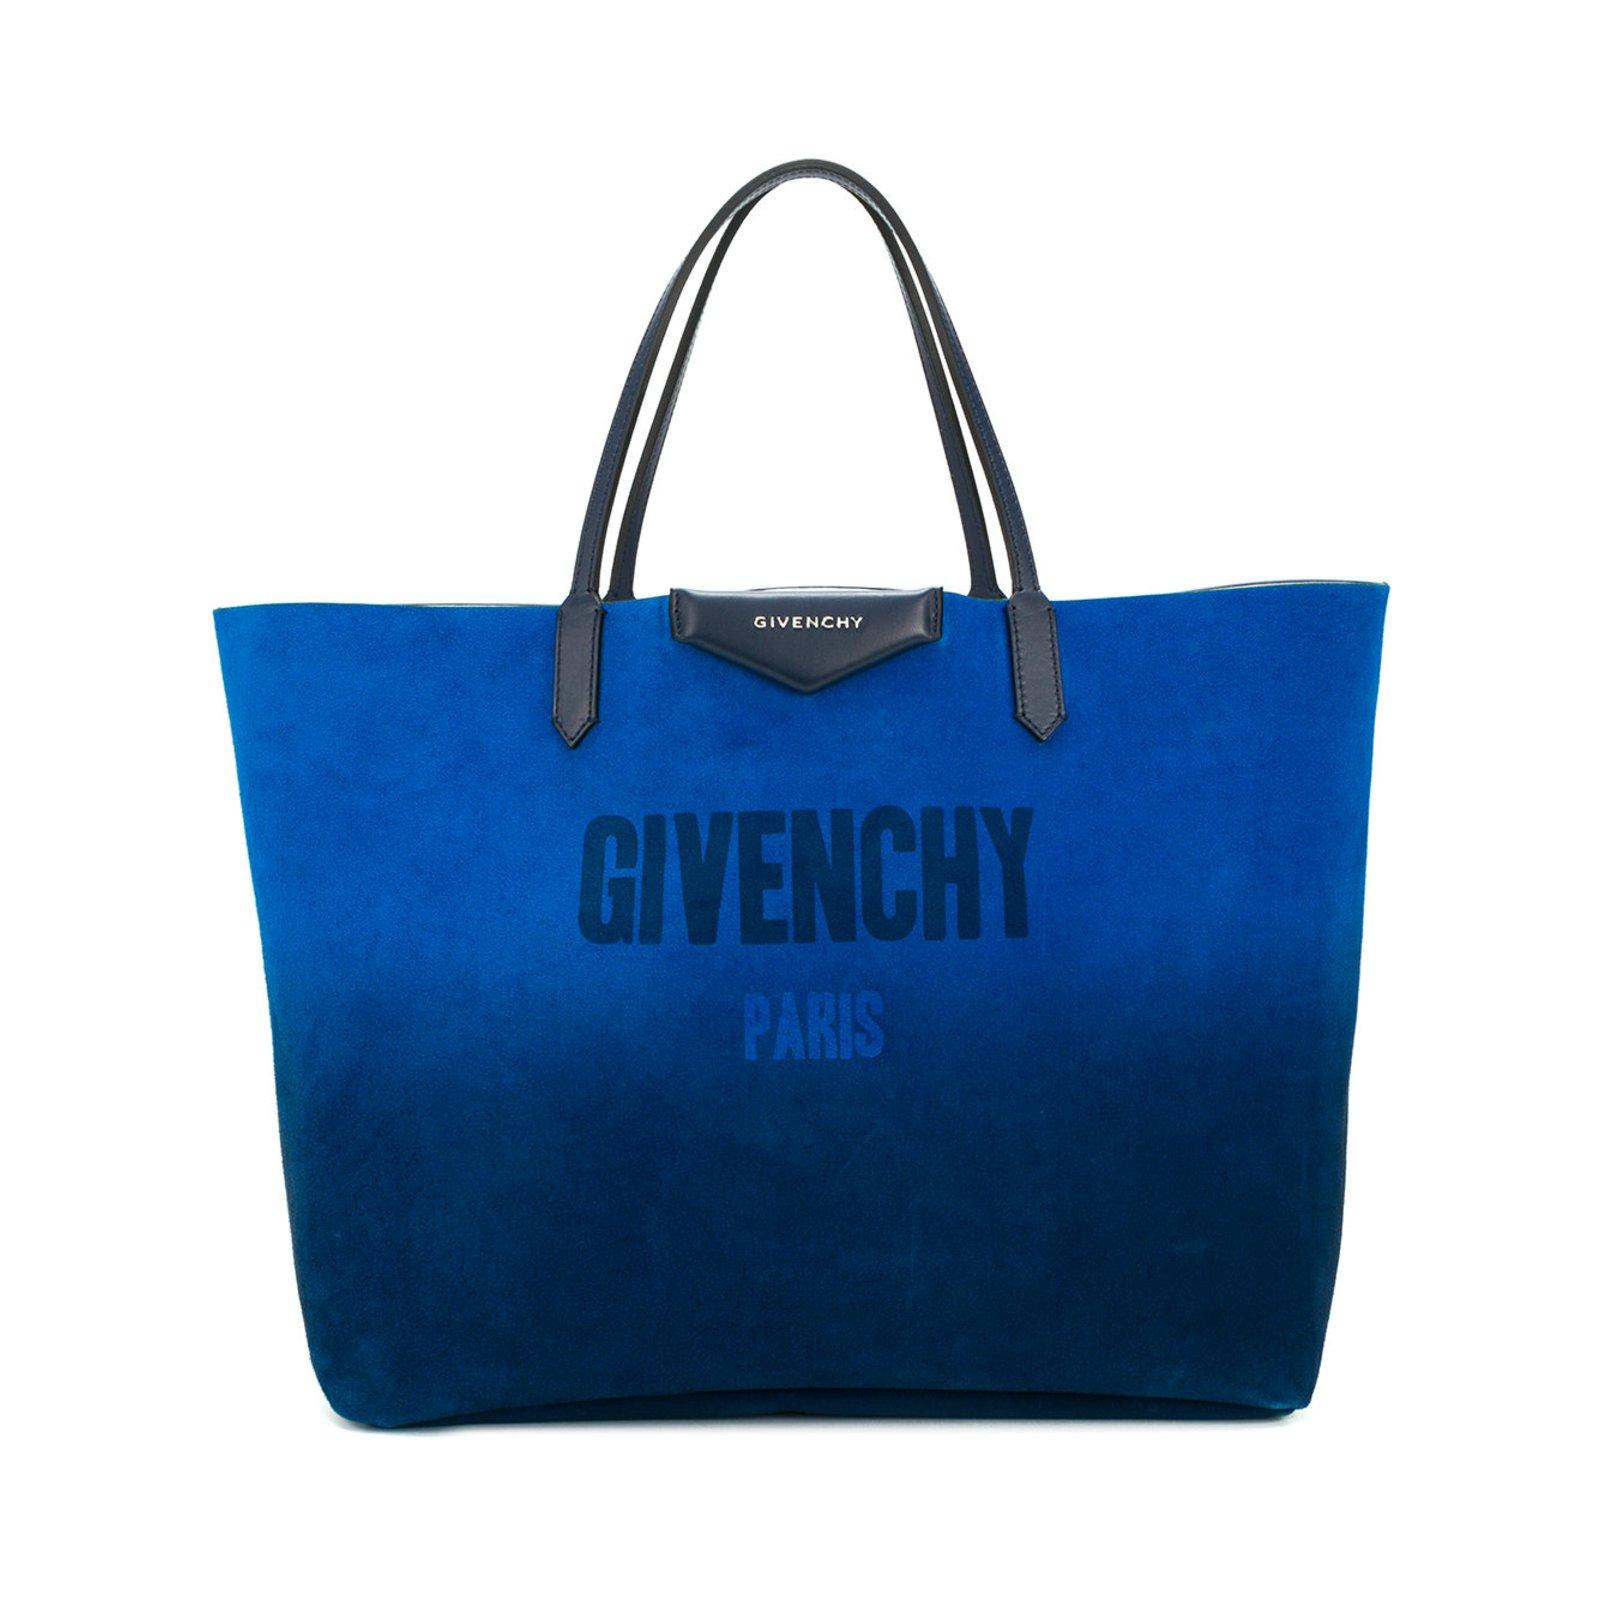 38e8c985dd91 Givenchy Givenchy Antigona Shopping Tote Handbags Leather Silvery ...